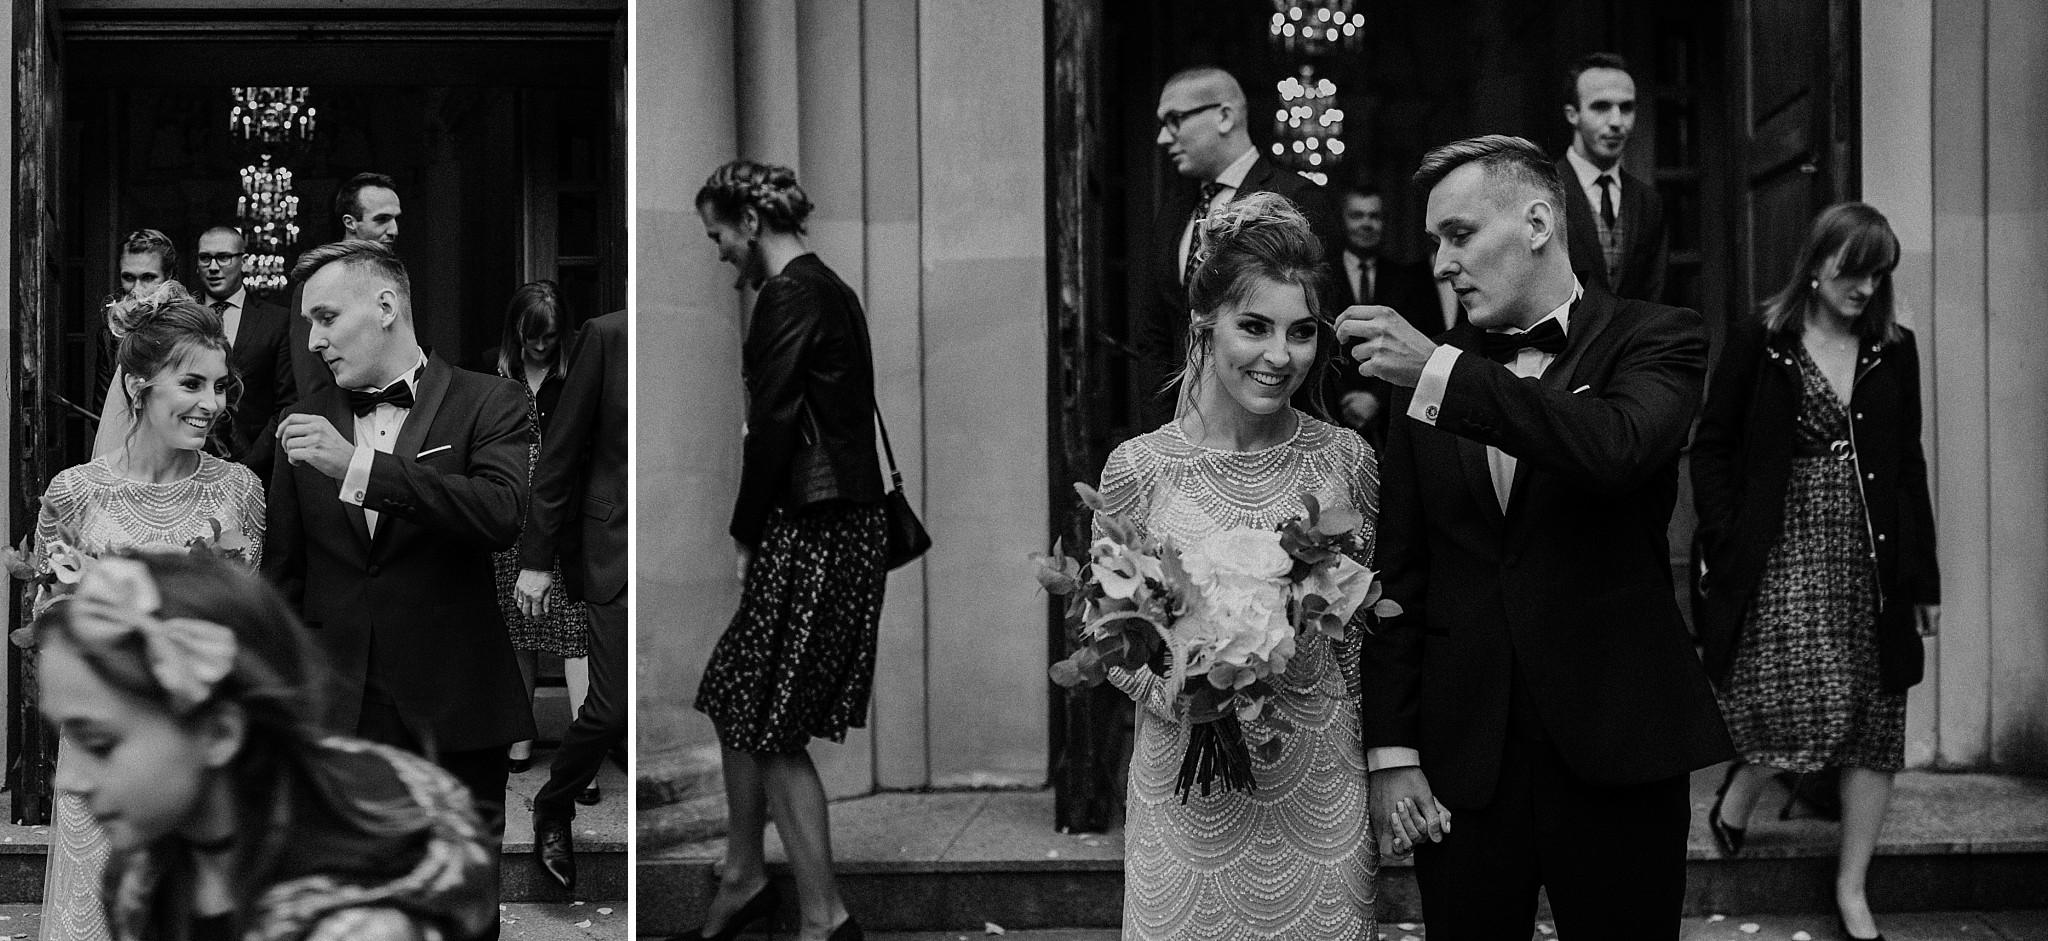 fotograf poznan wesele dobra truskawka piekne wesele pod poznaniem wesele w dobrej truskawce piekna para mloda slub marzen slub koronawirus slub listopad wesele koronawirus 224